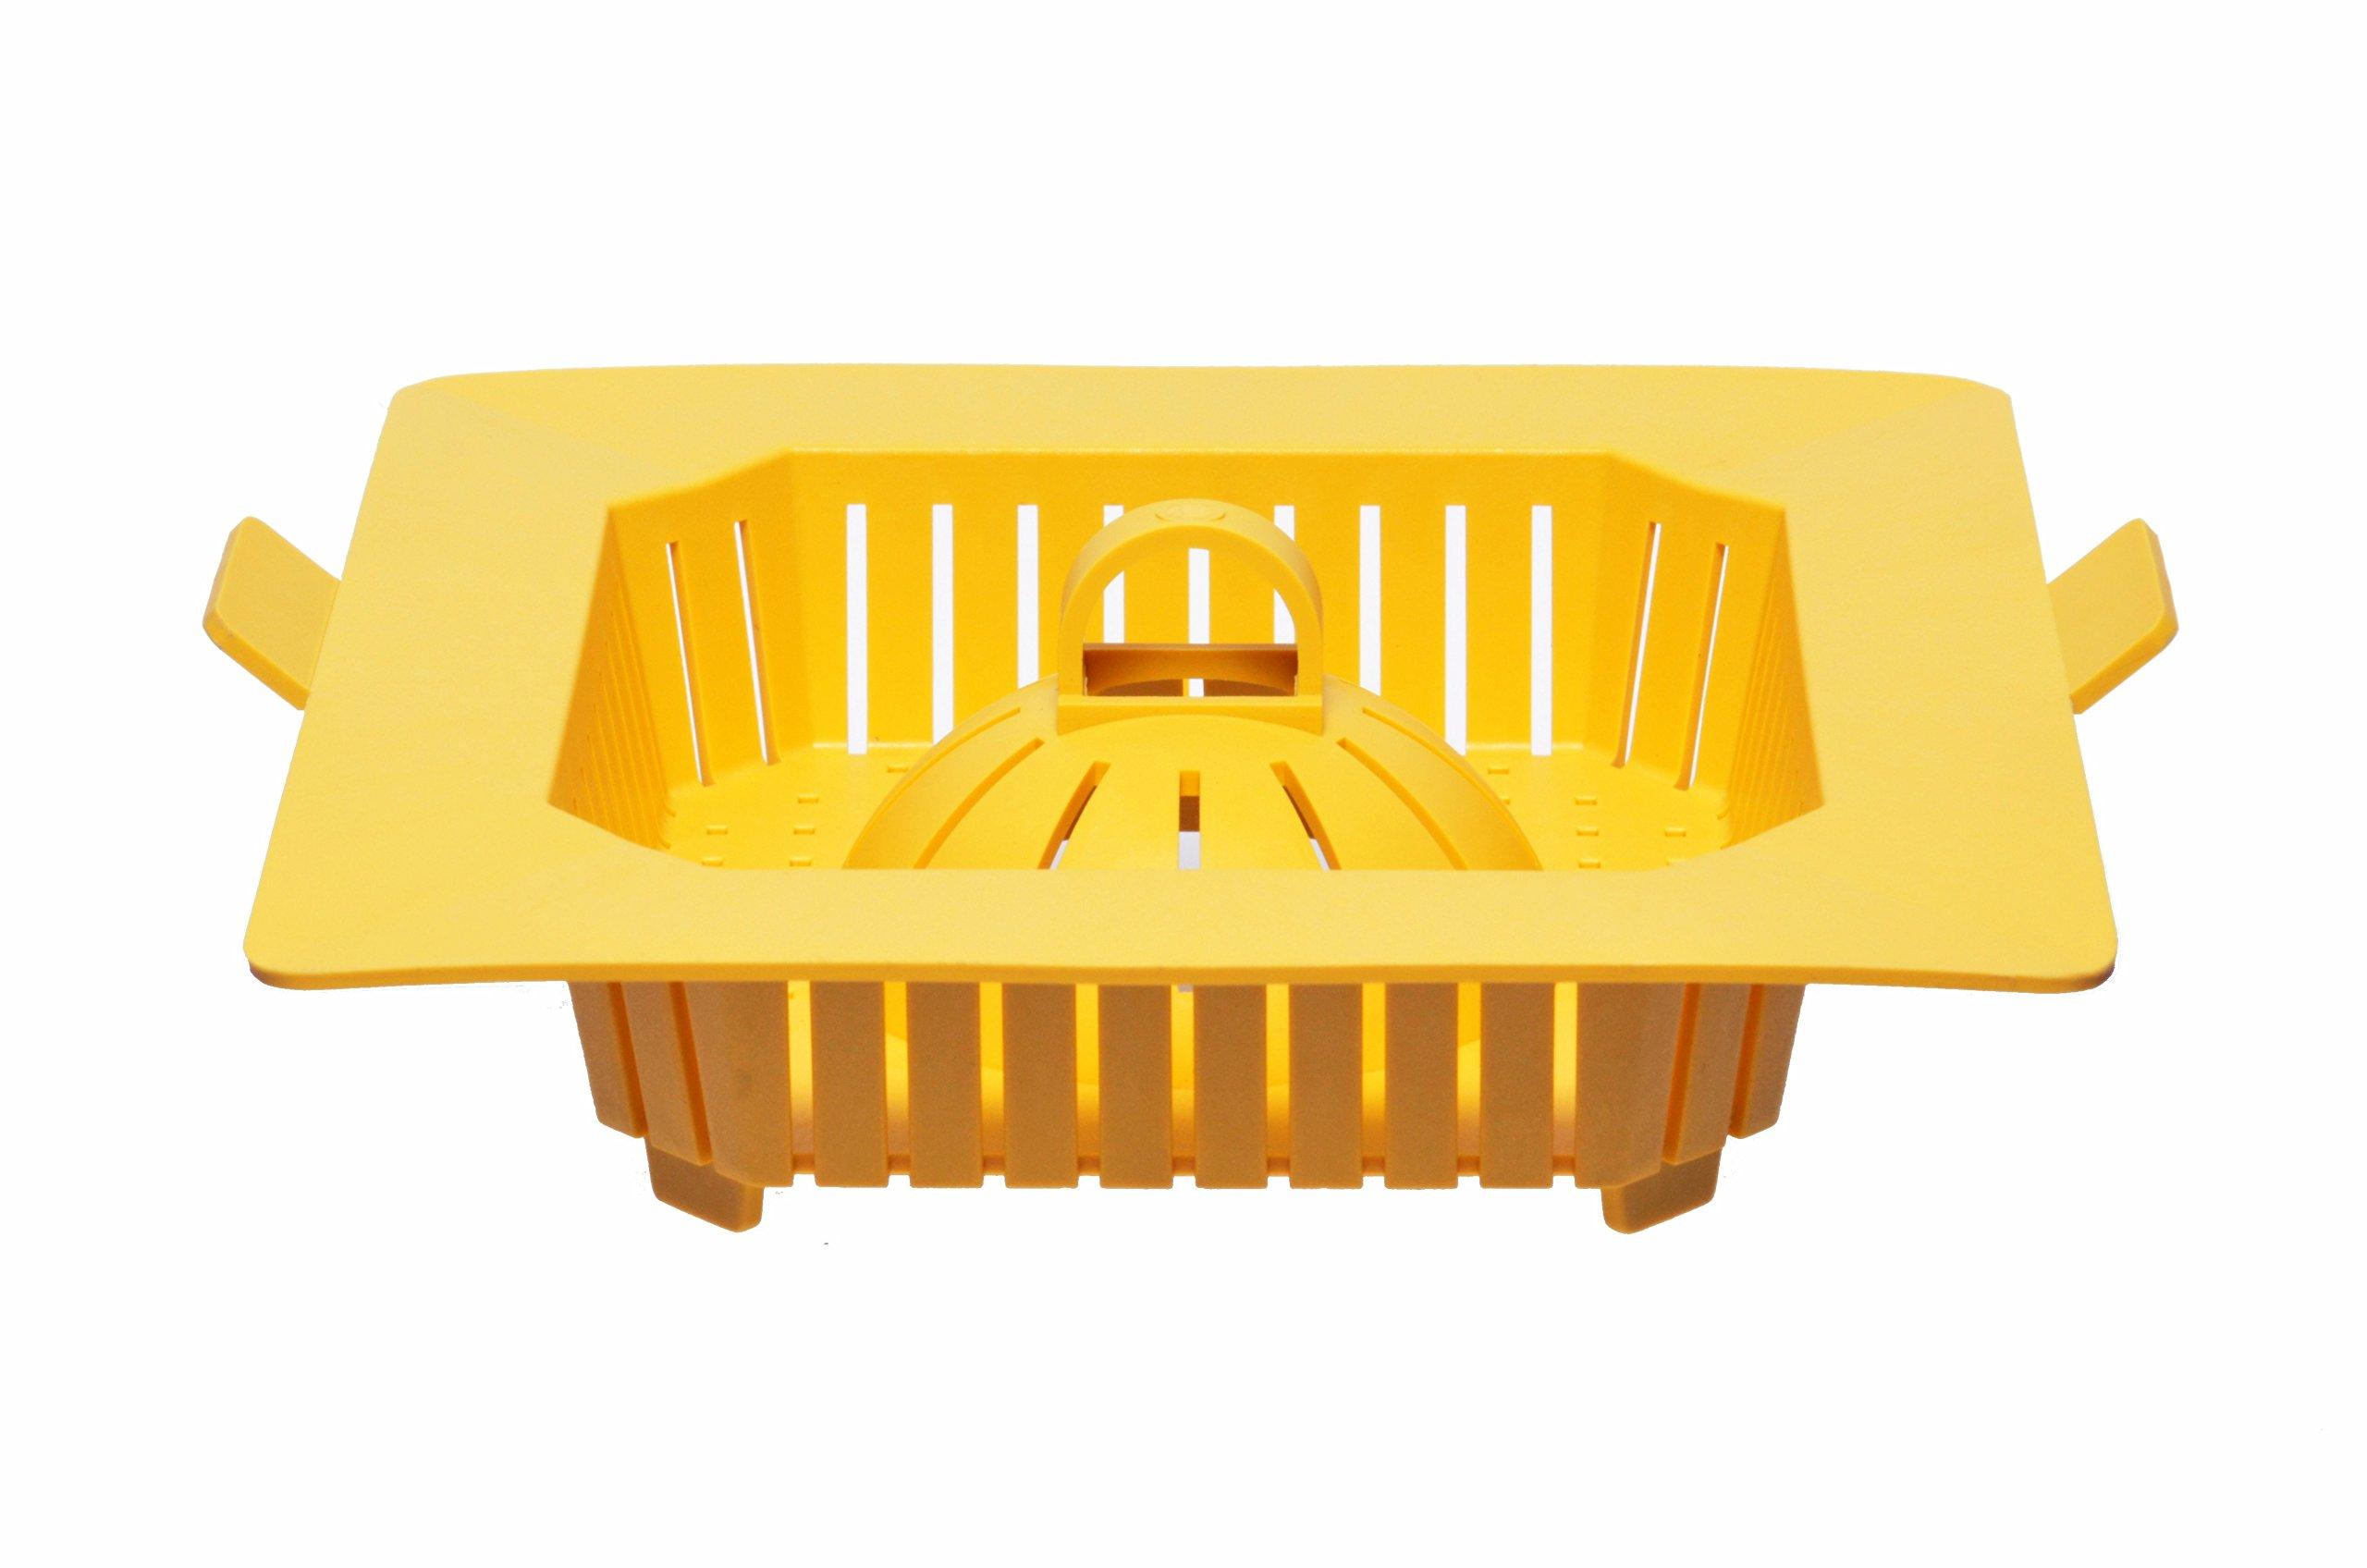 10 3/4 Inch PermaDrain Safety Strainer Basket. Fits 12 Inch Floor Sinks. For Zurn, Oatey, Wade, Josam, Smith, and Other Floor Sink Brands.